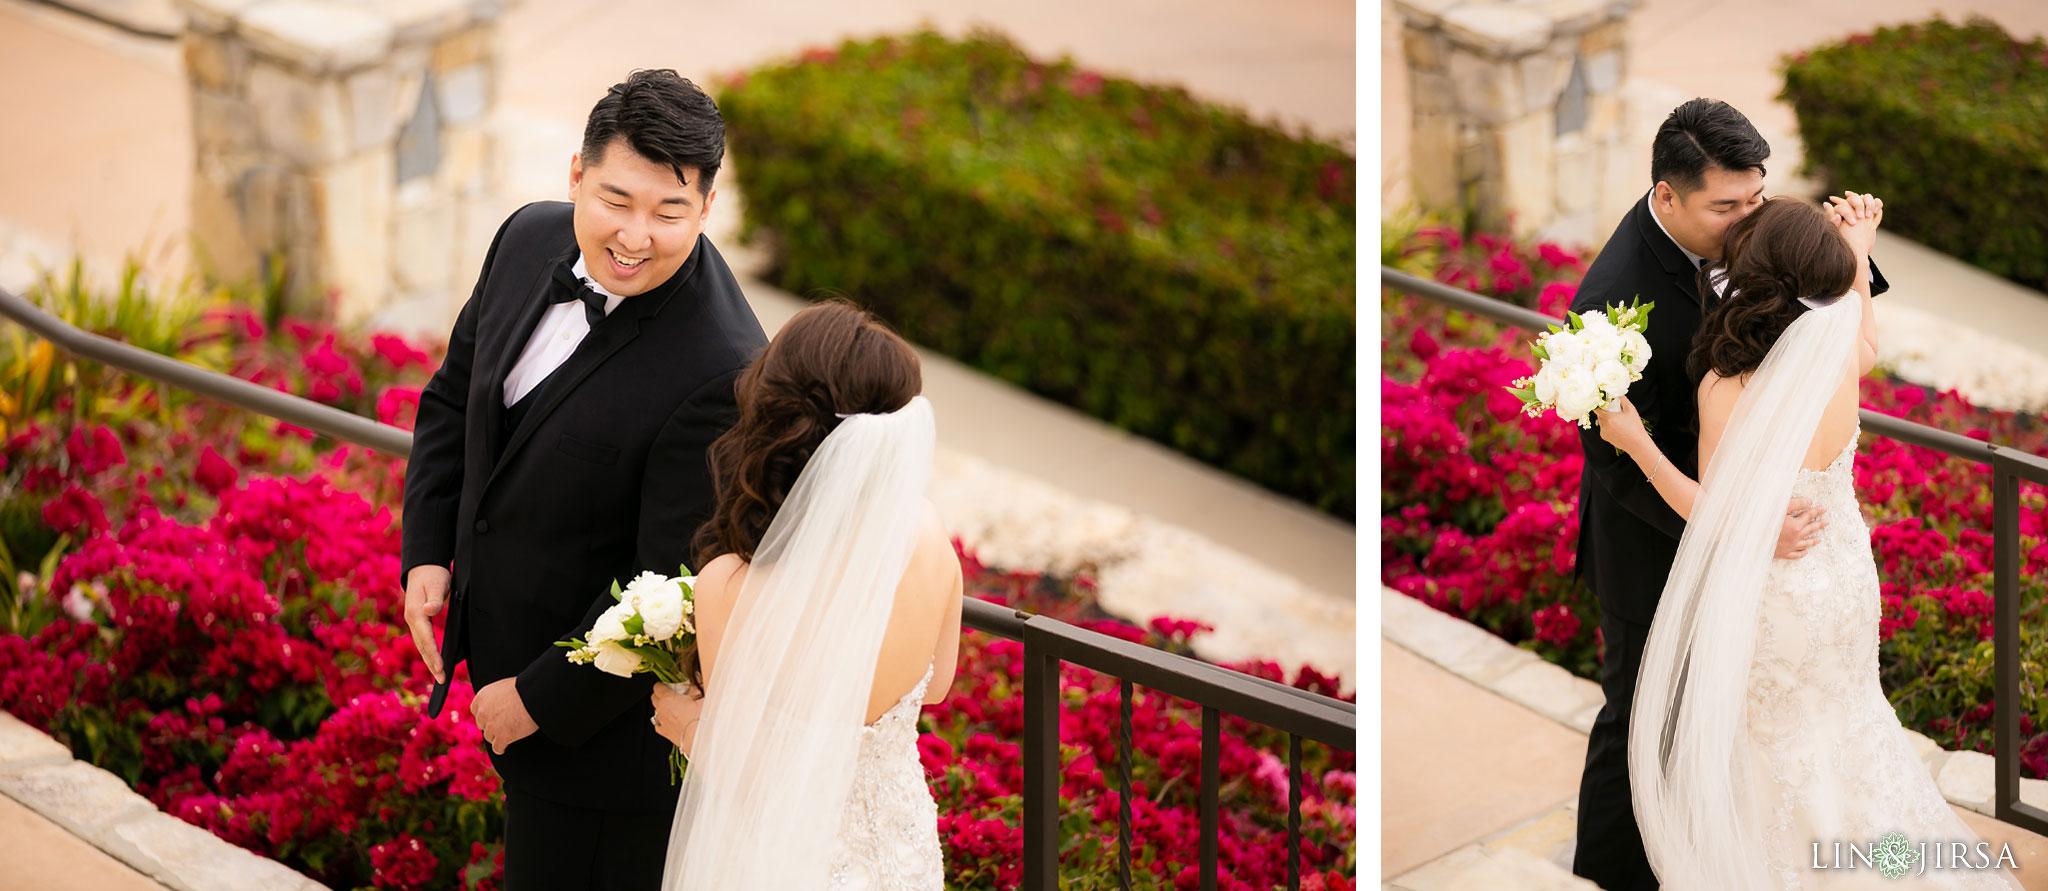 11 trump national golf club rancho palos verdes wedding first look photography